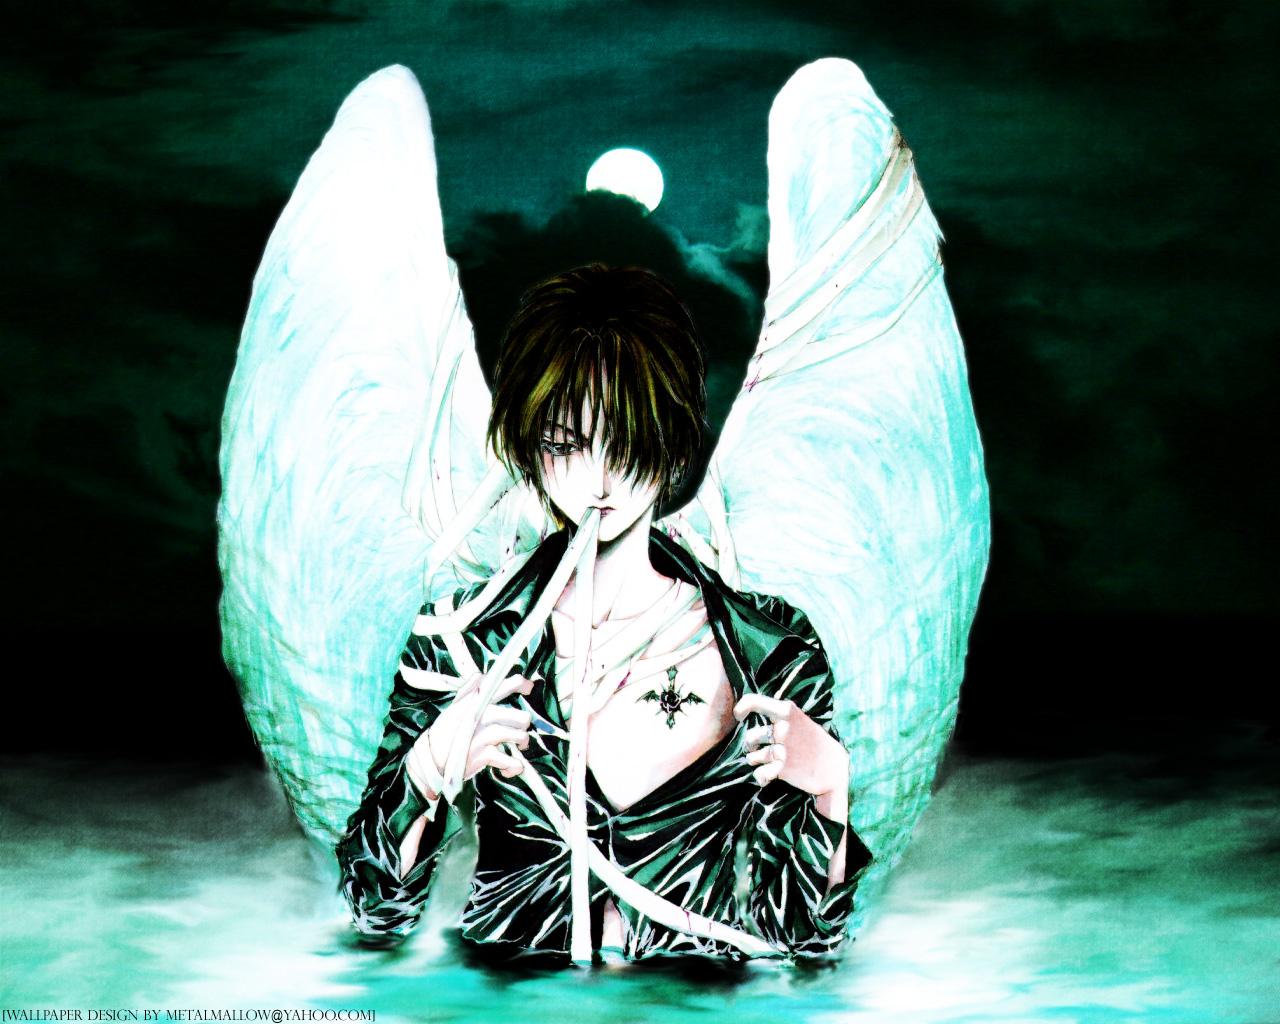 Angel Sanctuary Manga Fantasy Dark Angels Wallpaper Desktop 1280x1024